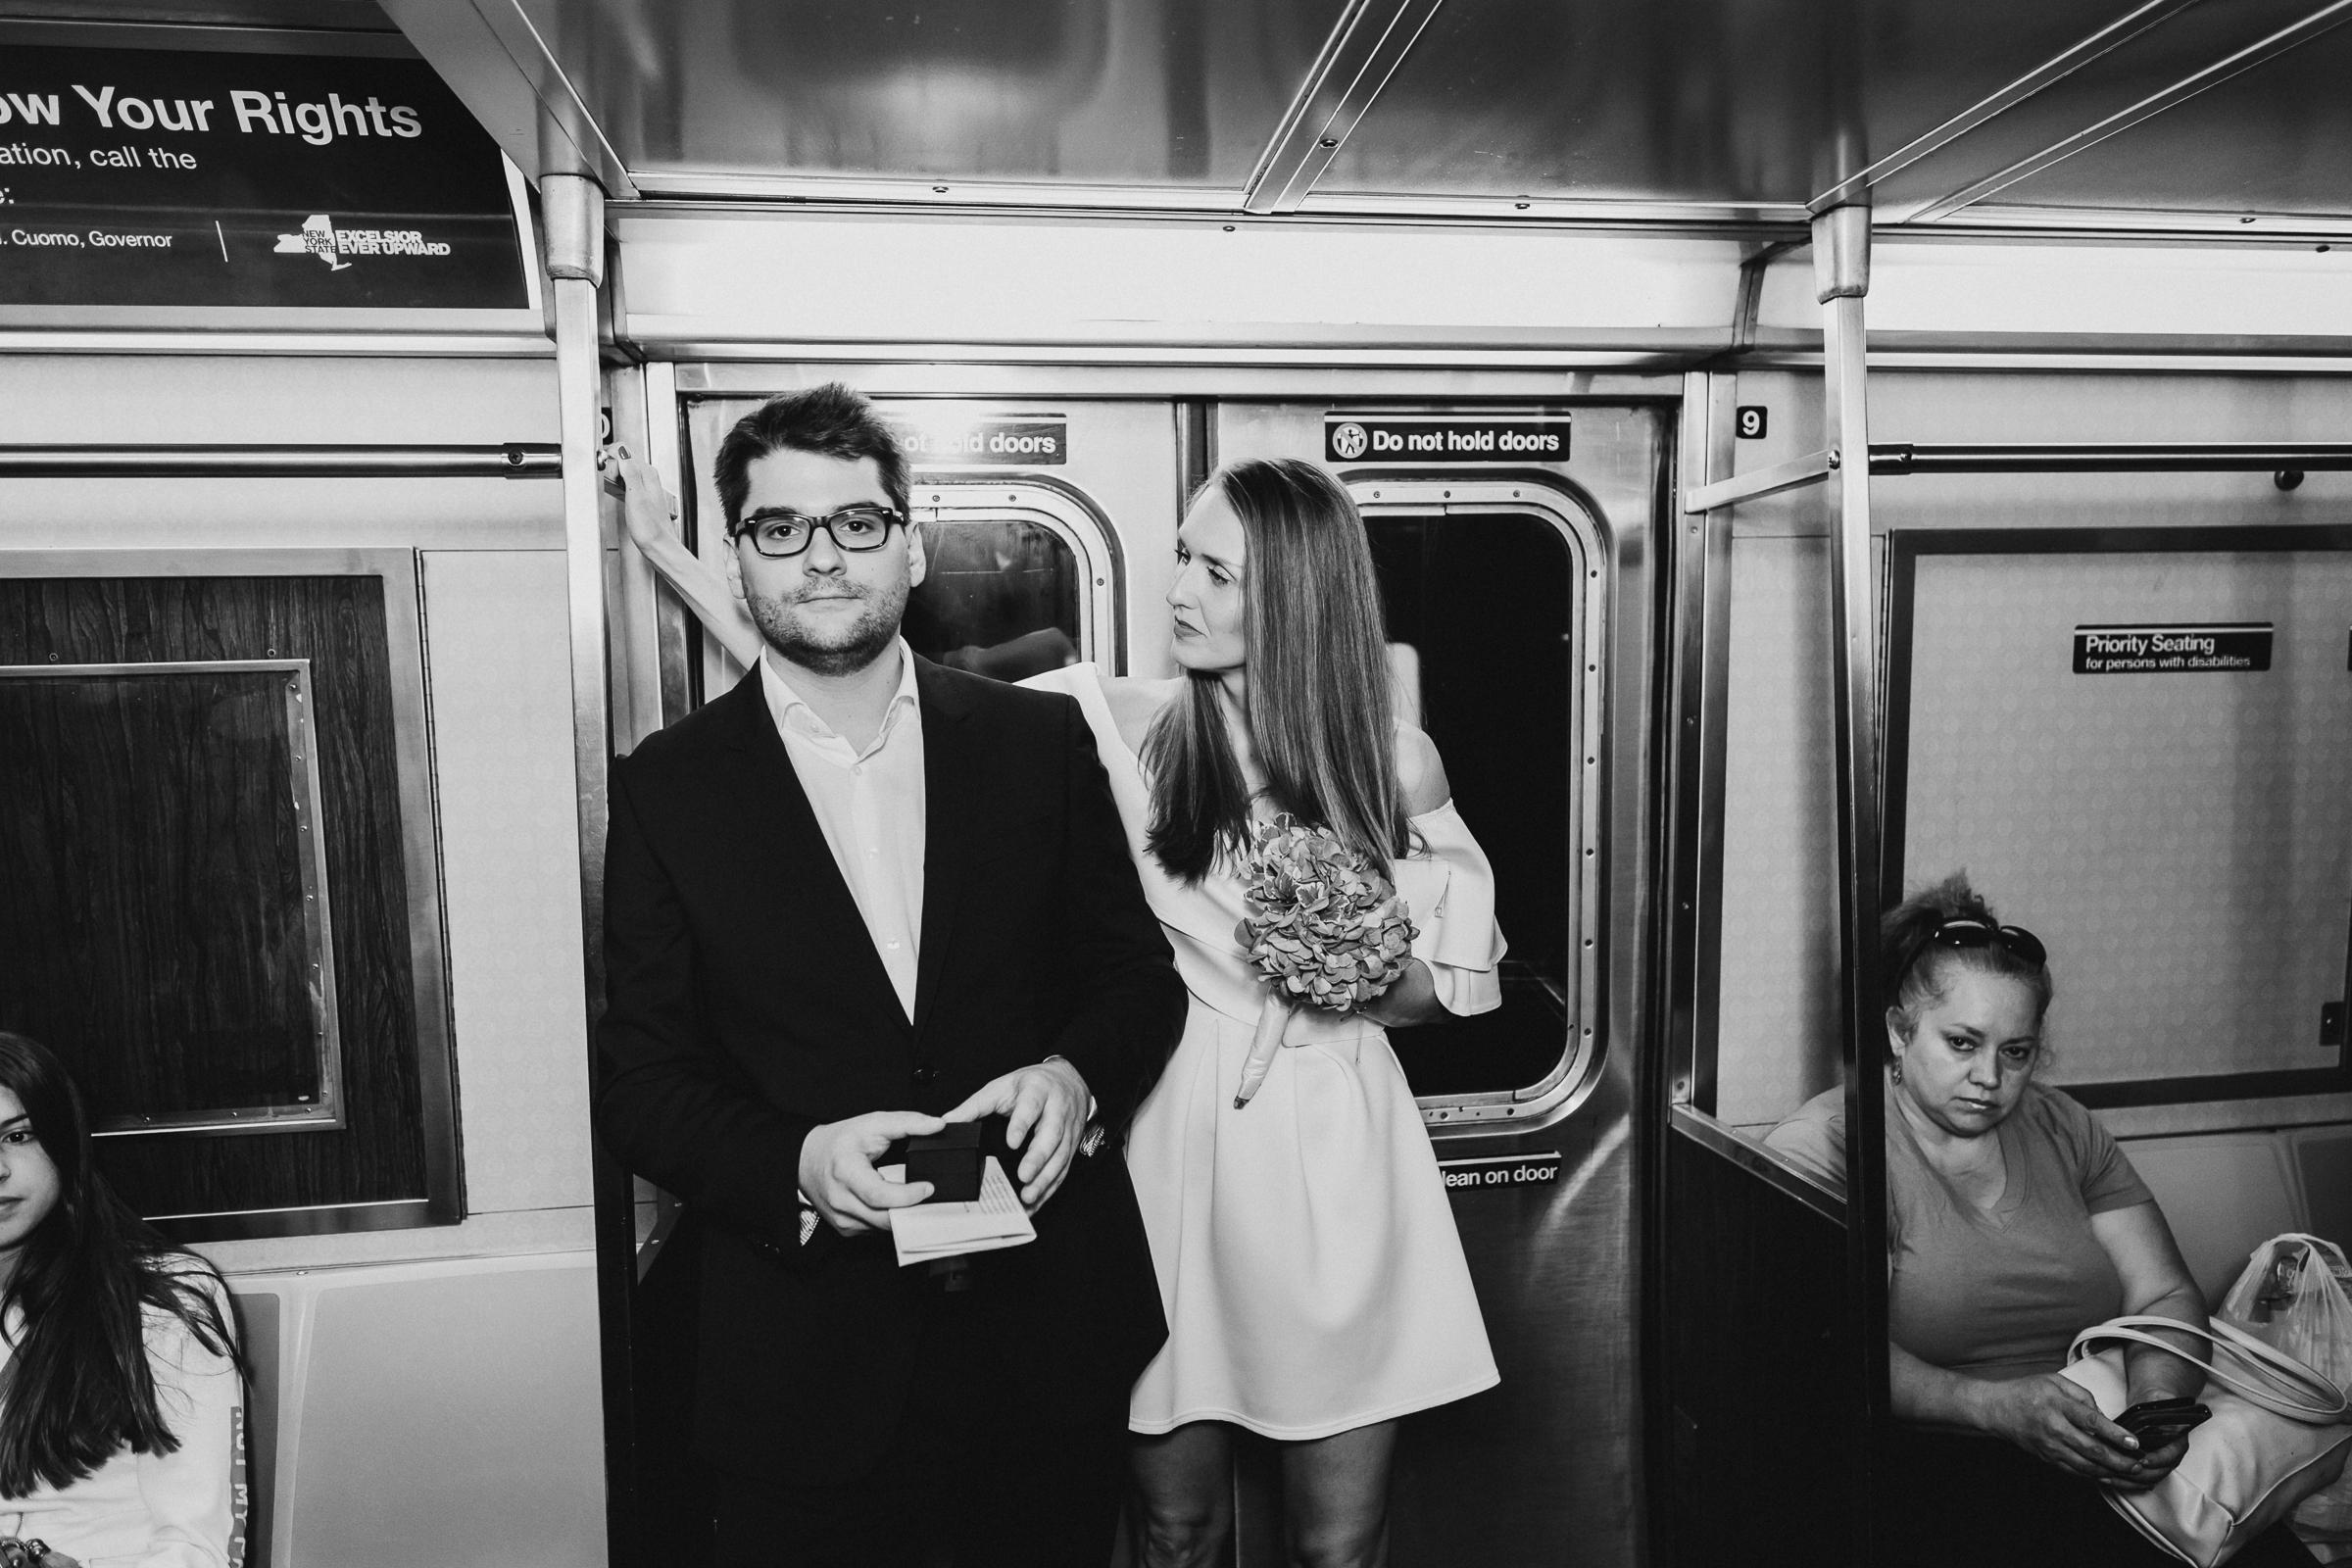 New-York-City-Hall-Elopement-NYC-Documentary-Wedding-Photographer-43.jpg